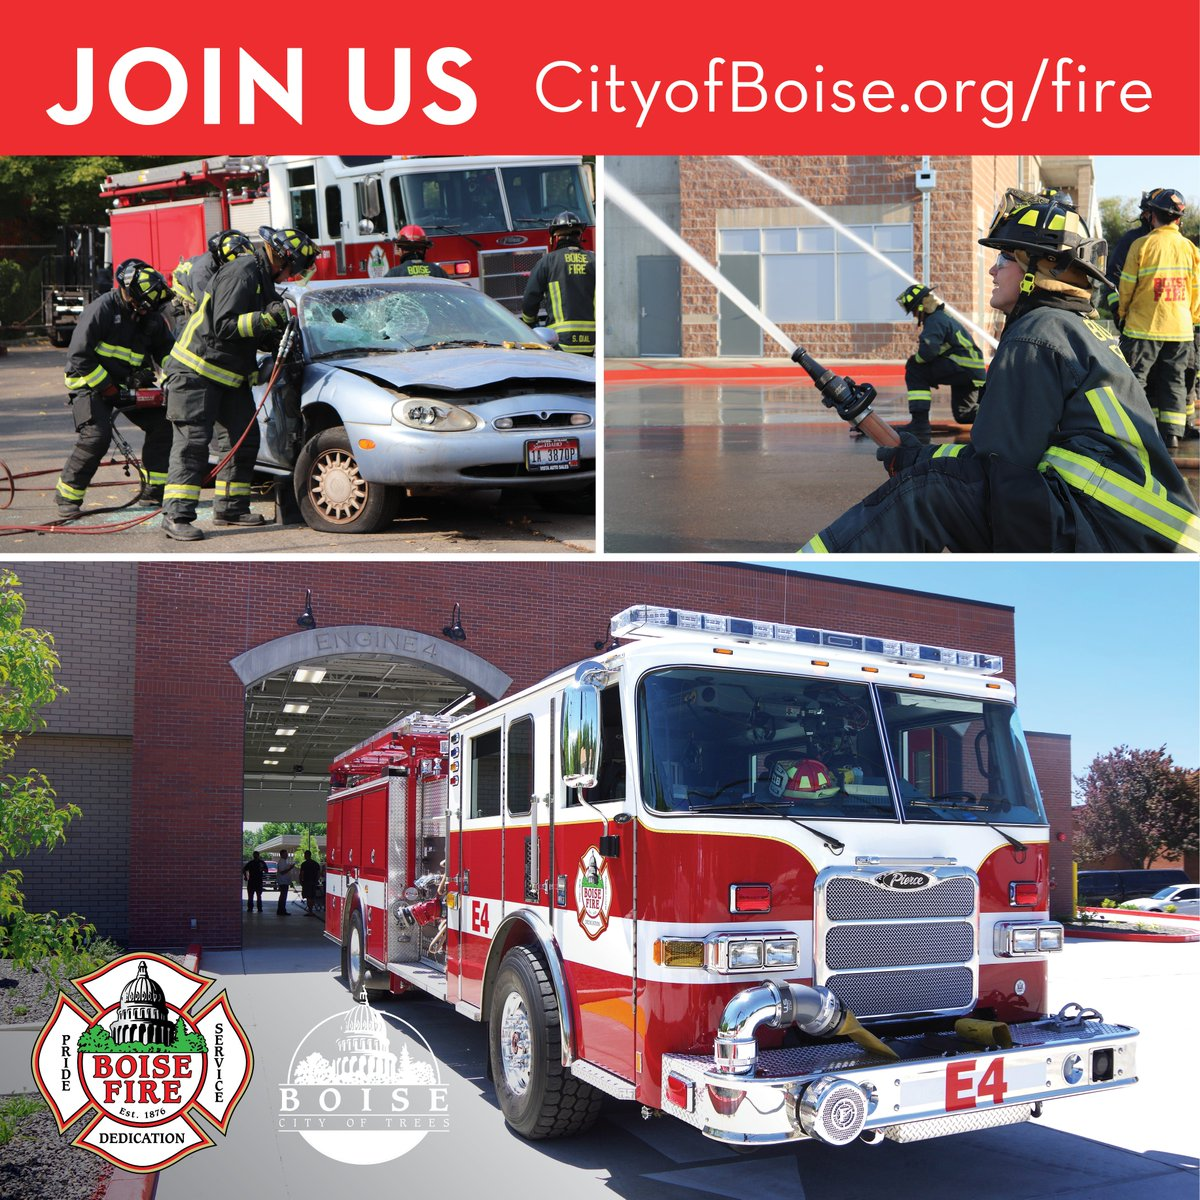 Boise Fire Dept  on Twitter: